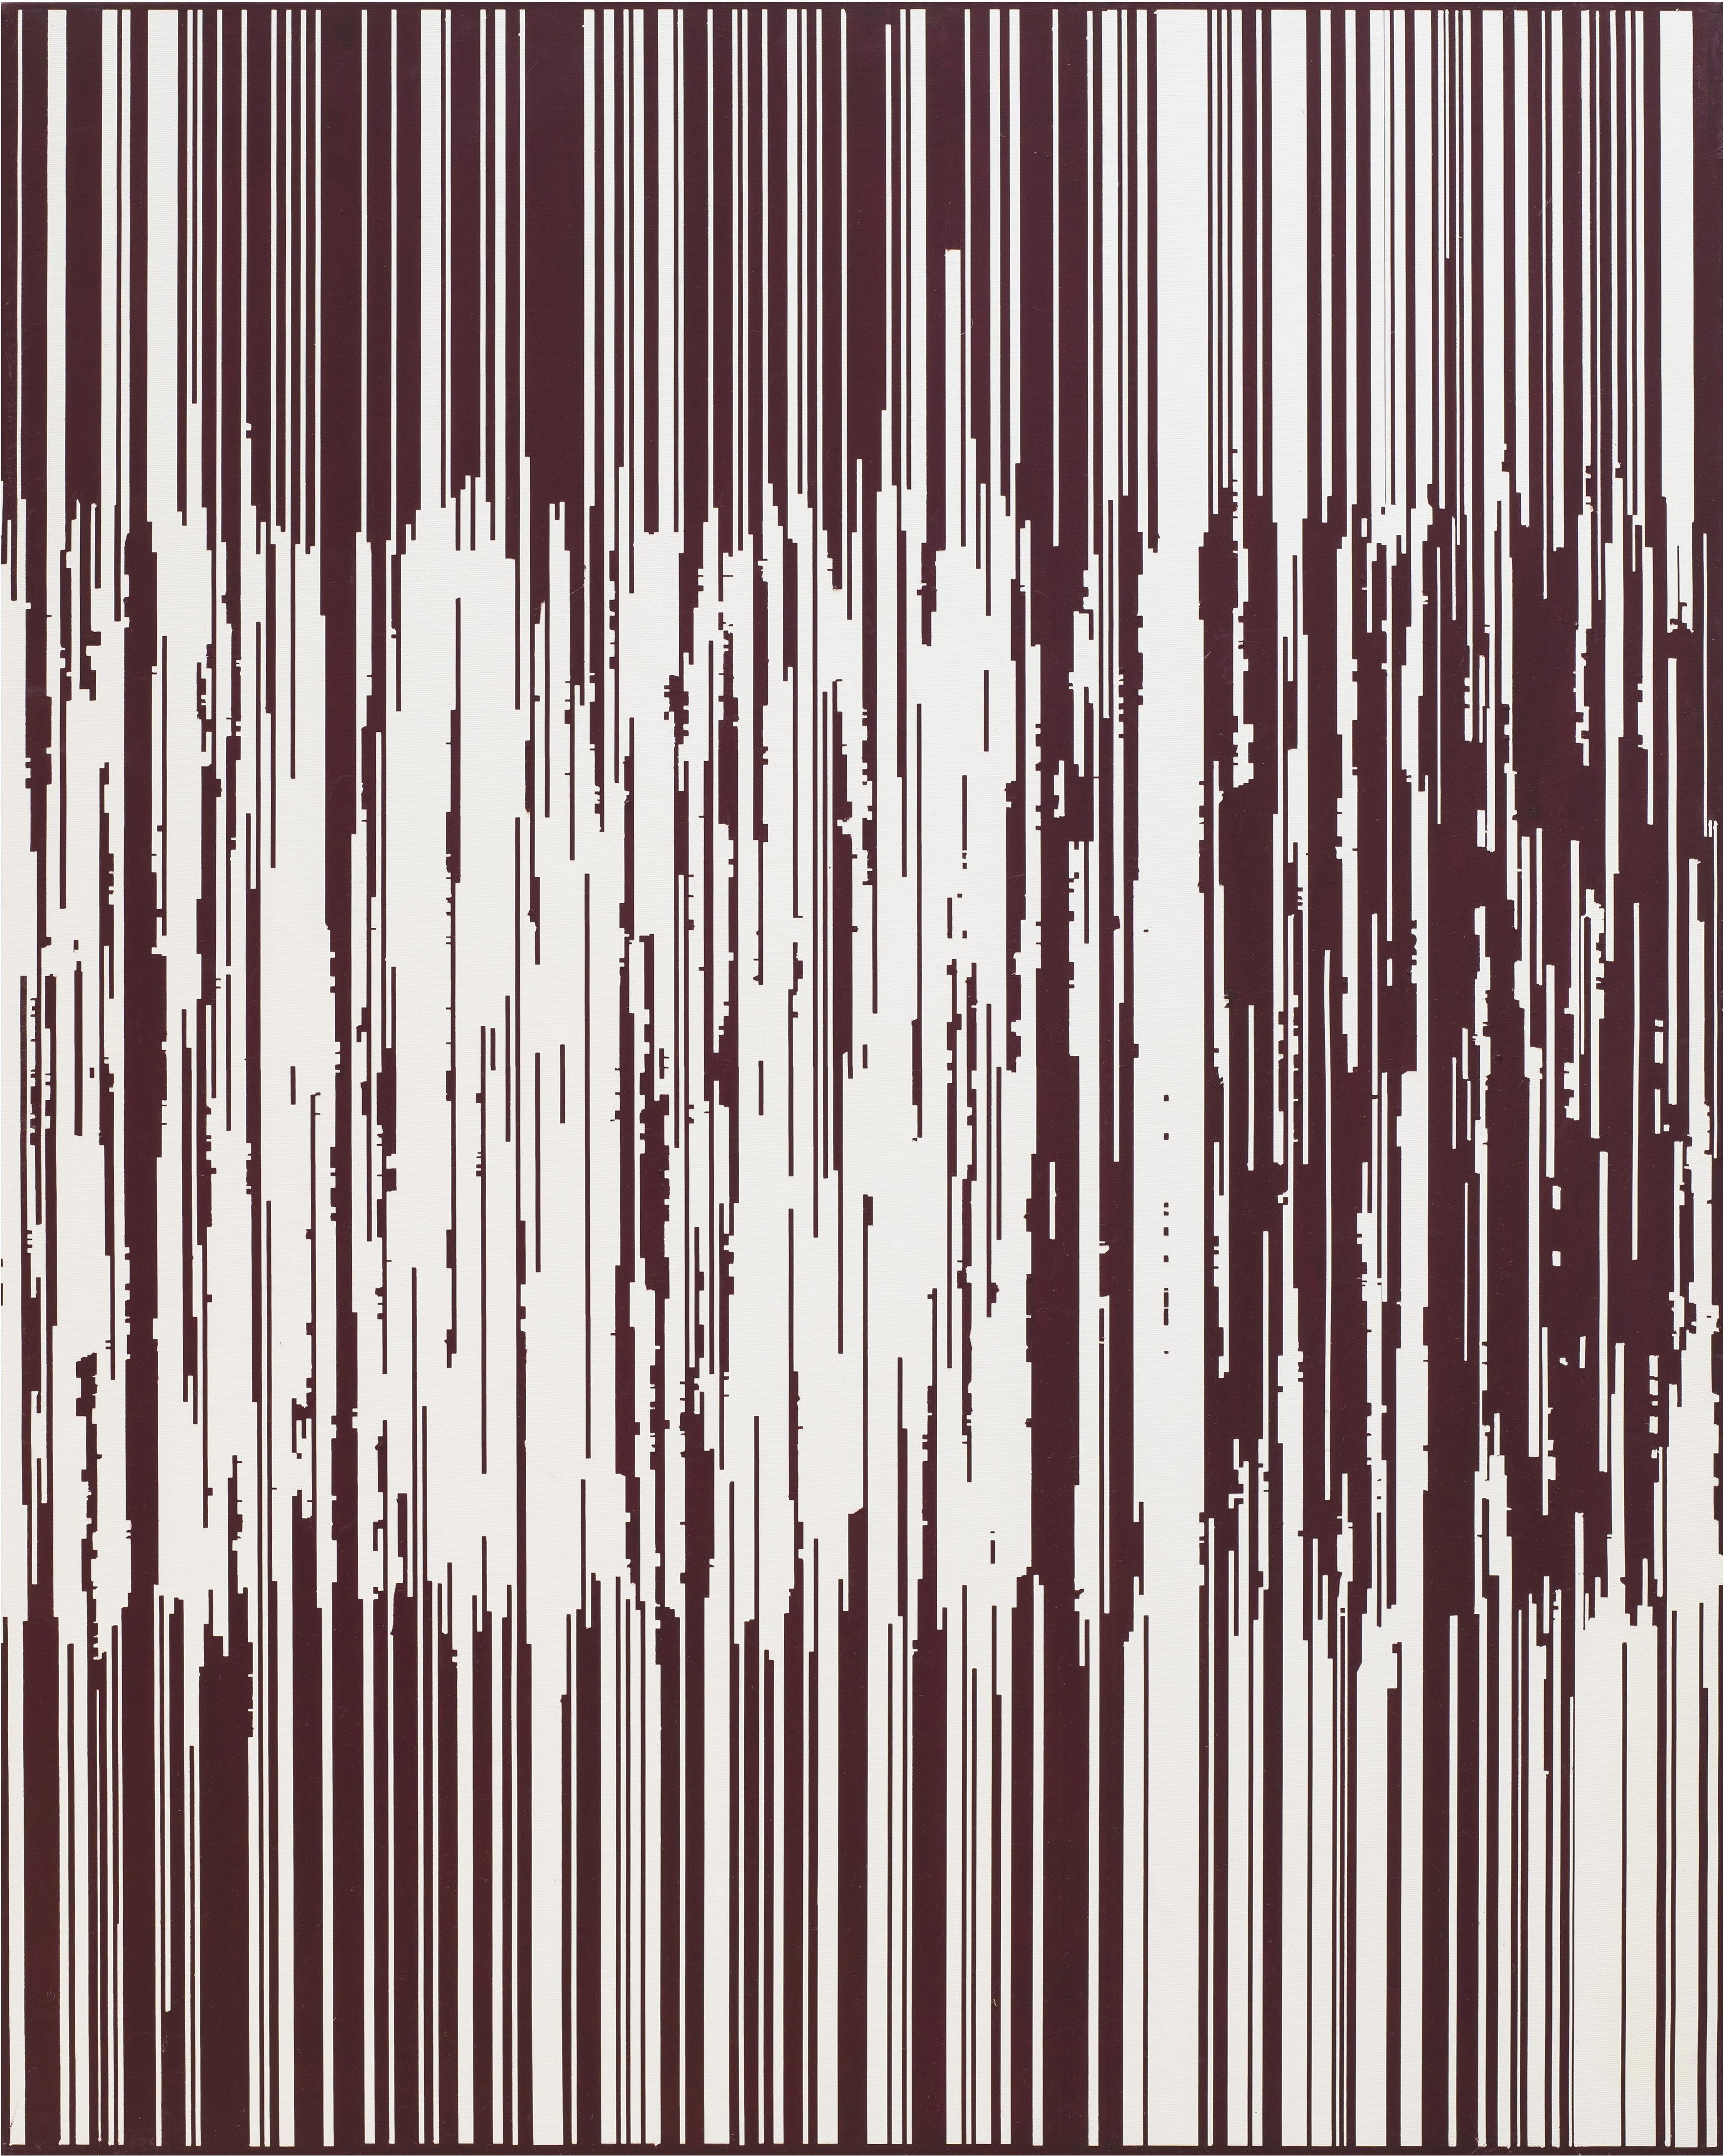 ENCODING 2015, Acrylic on canvas, 90.9 x 72.7cm (5)